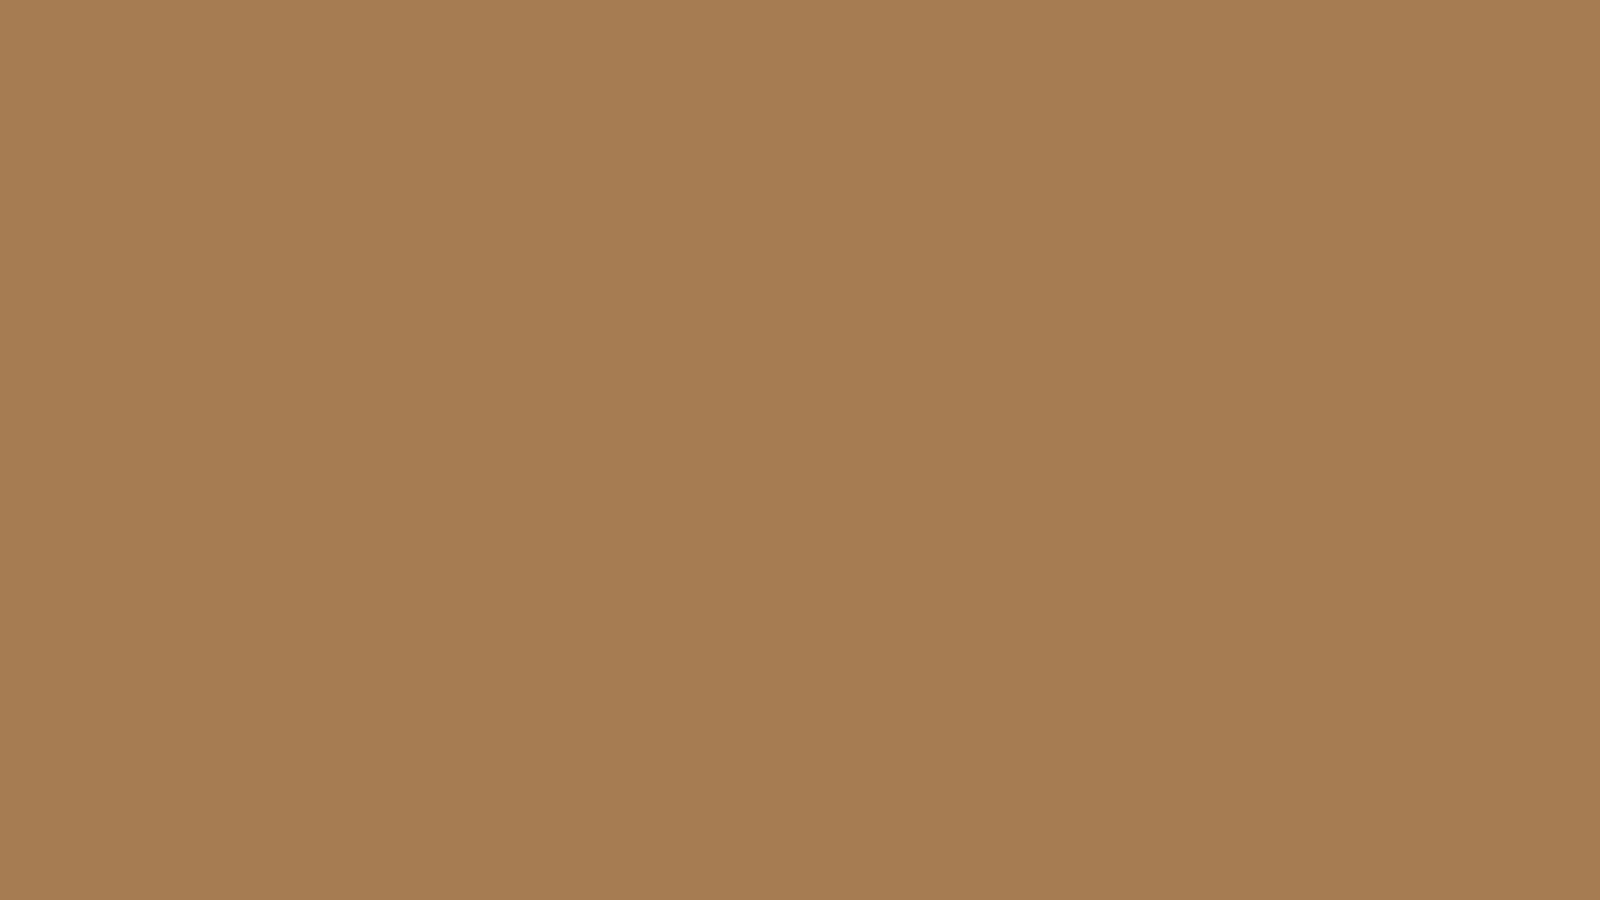 Anime Girl Wallpaper Hd Phones Light Brown Wallpaper 1600x900 6340